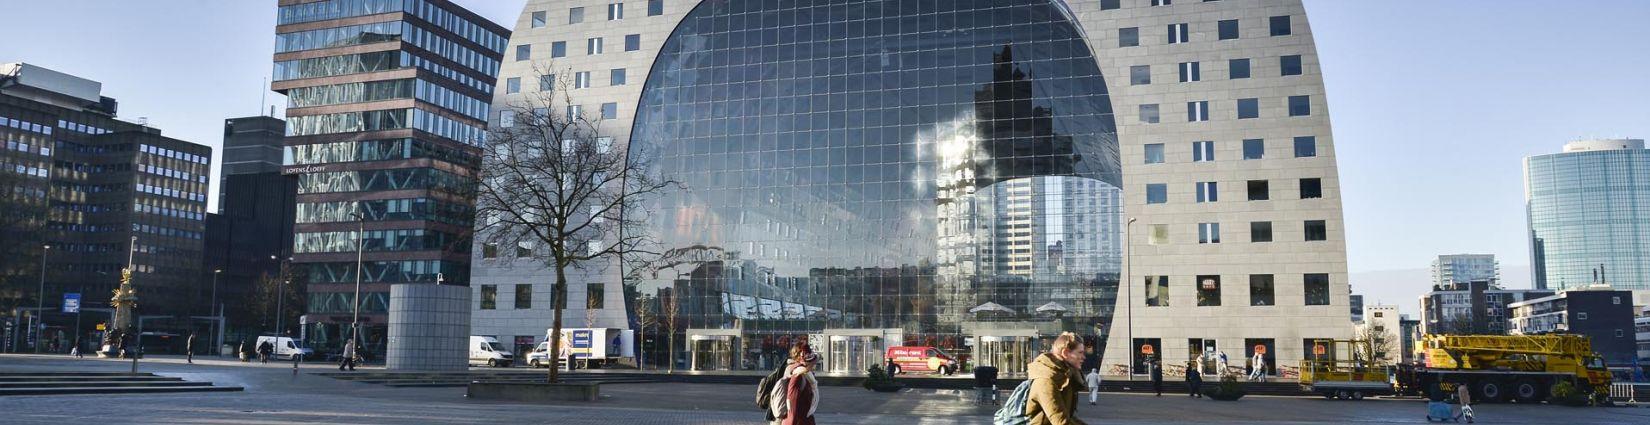 De Goede project Markthal - Rotterdam